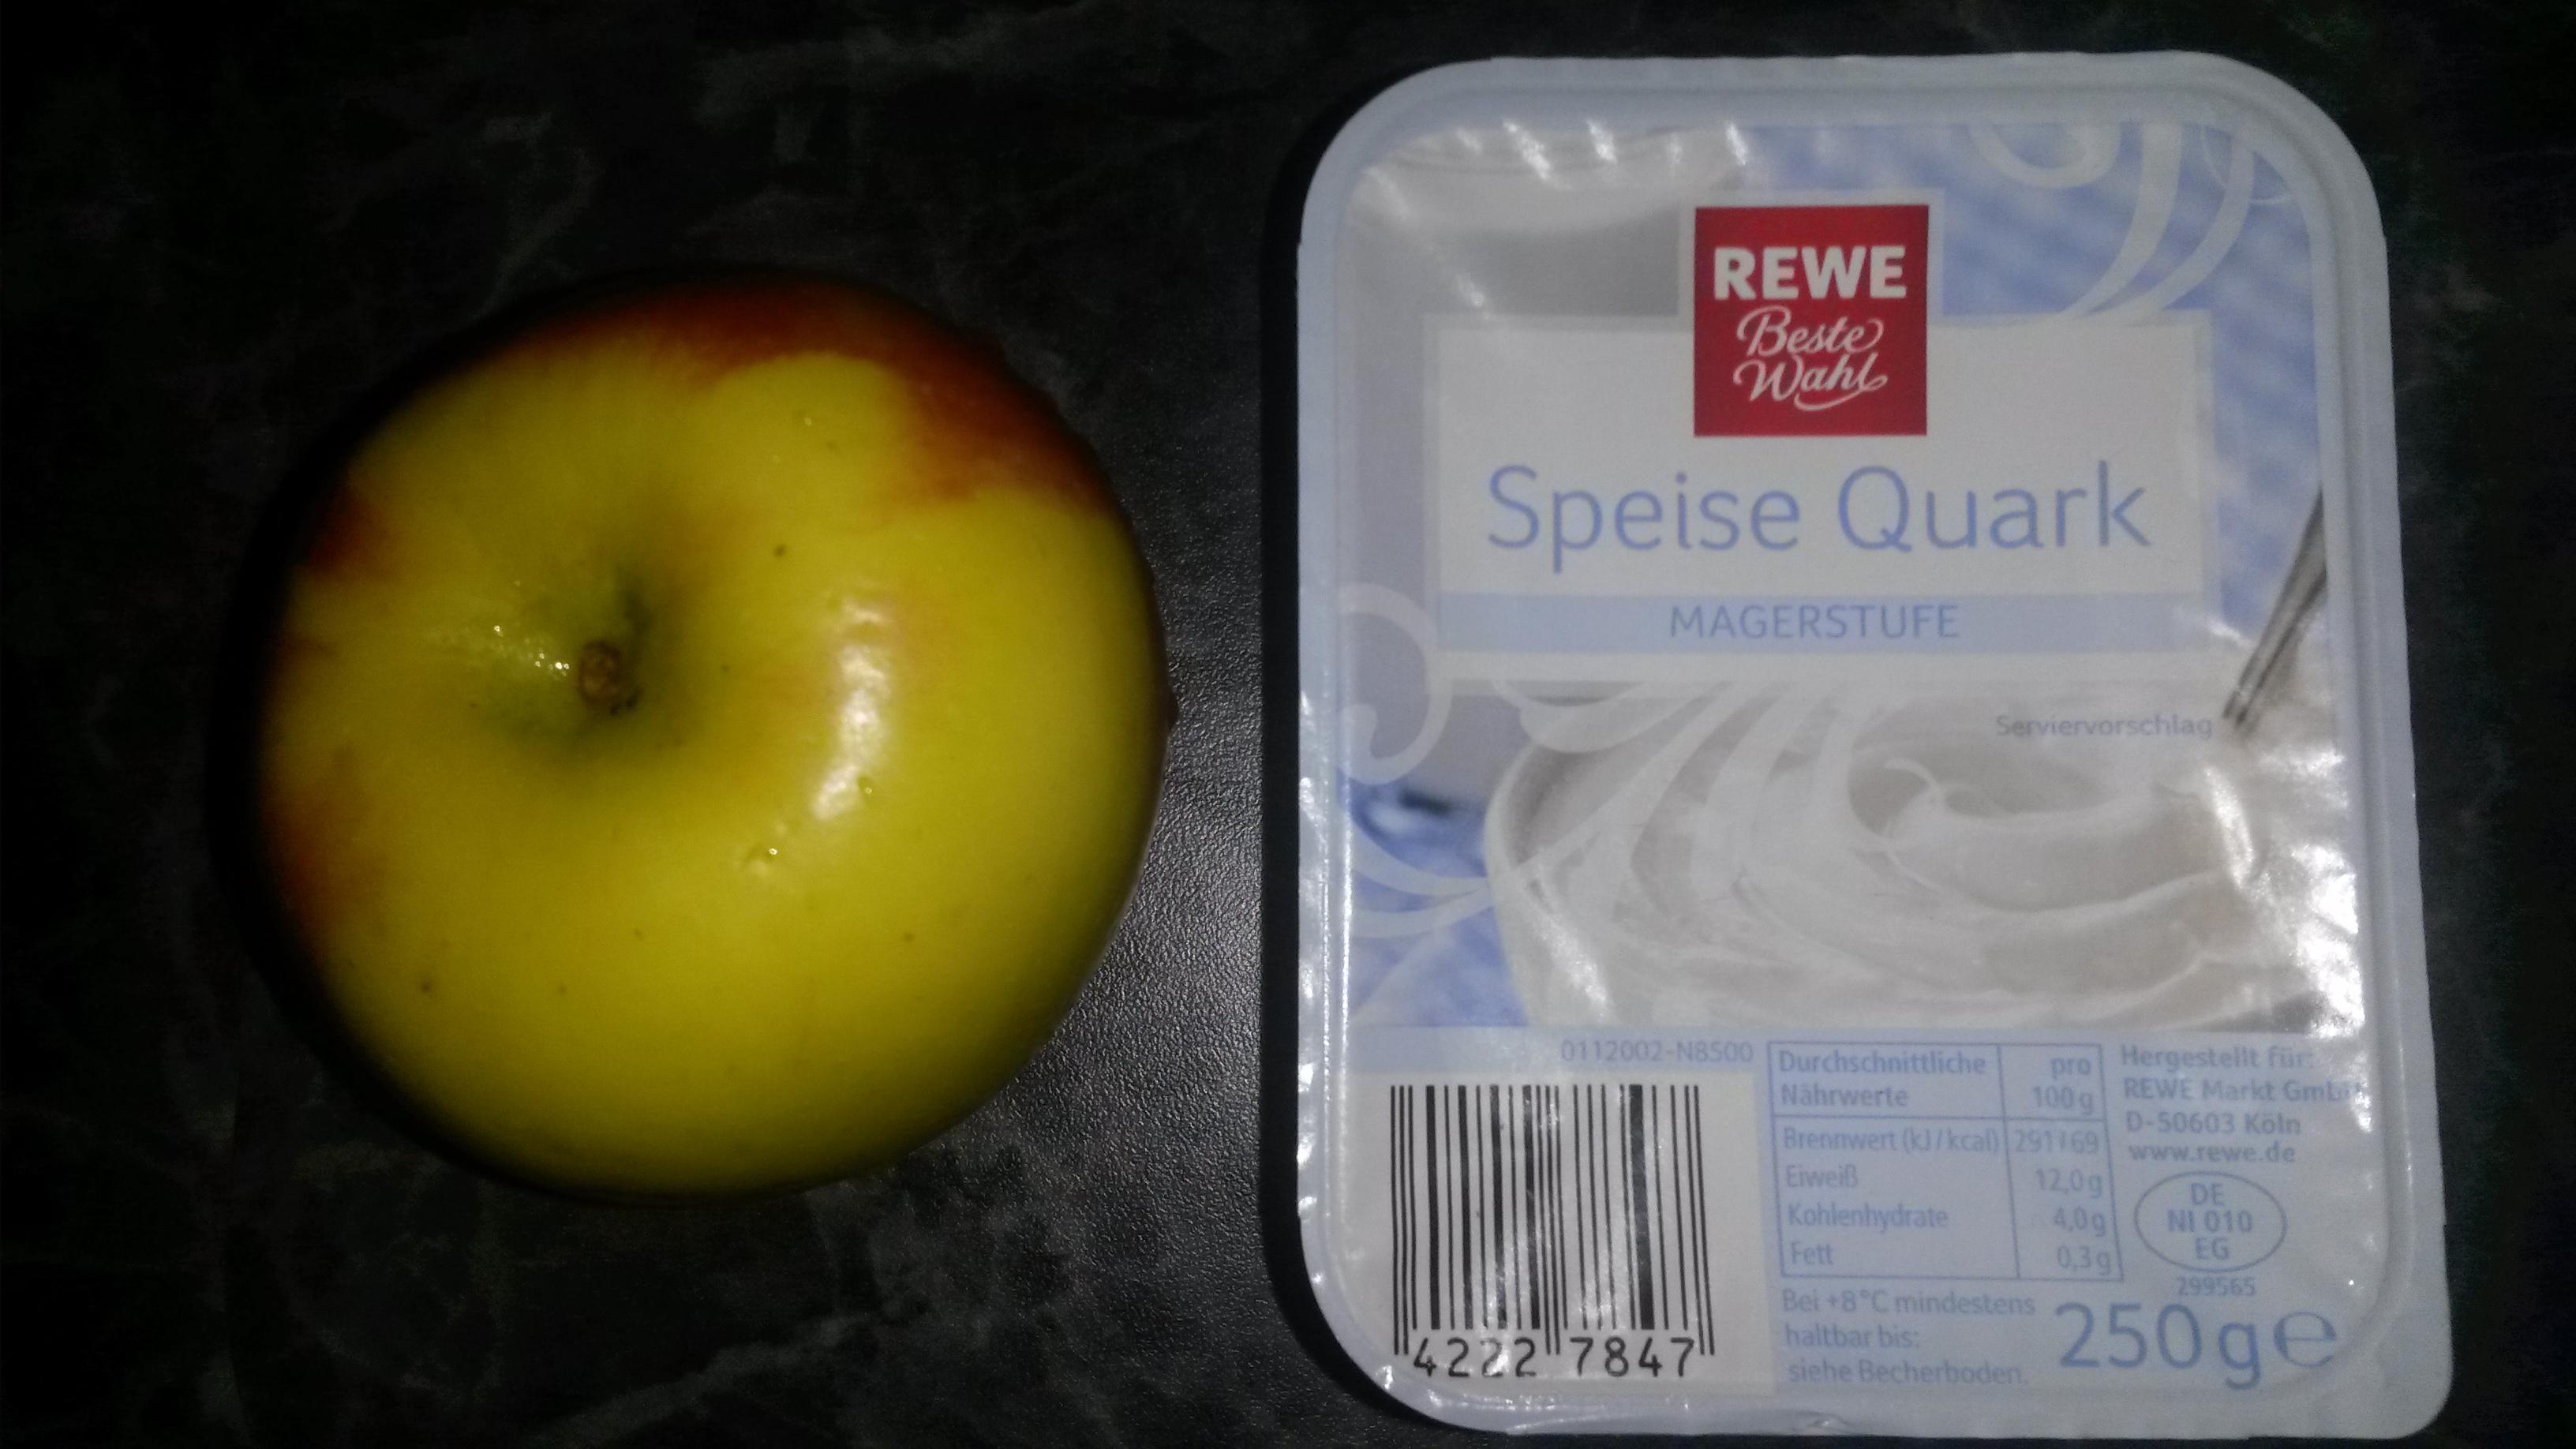 https://foodloader.net/sk0r_2014-01-26_Magerquark_und_Apfel.jpg